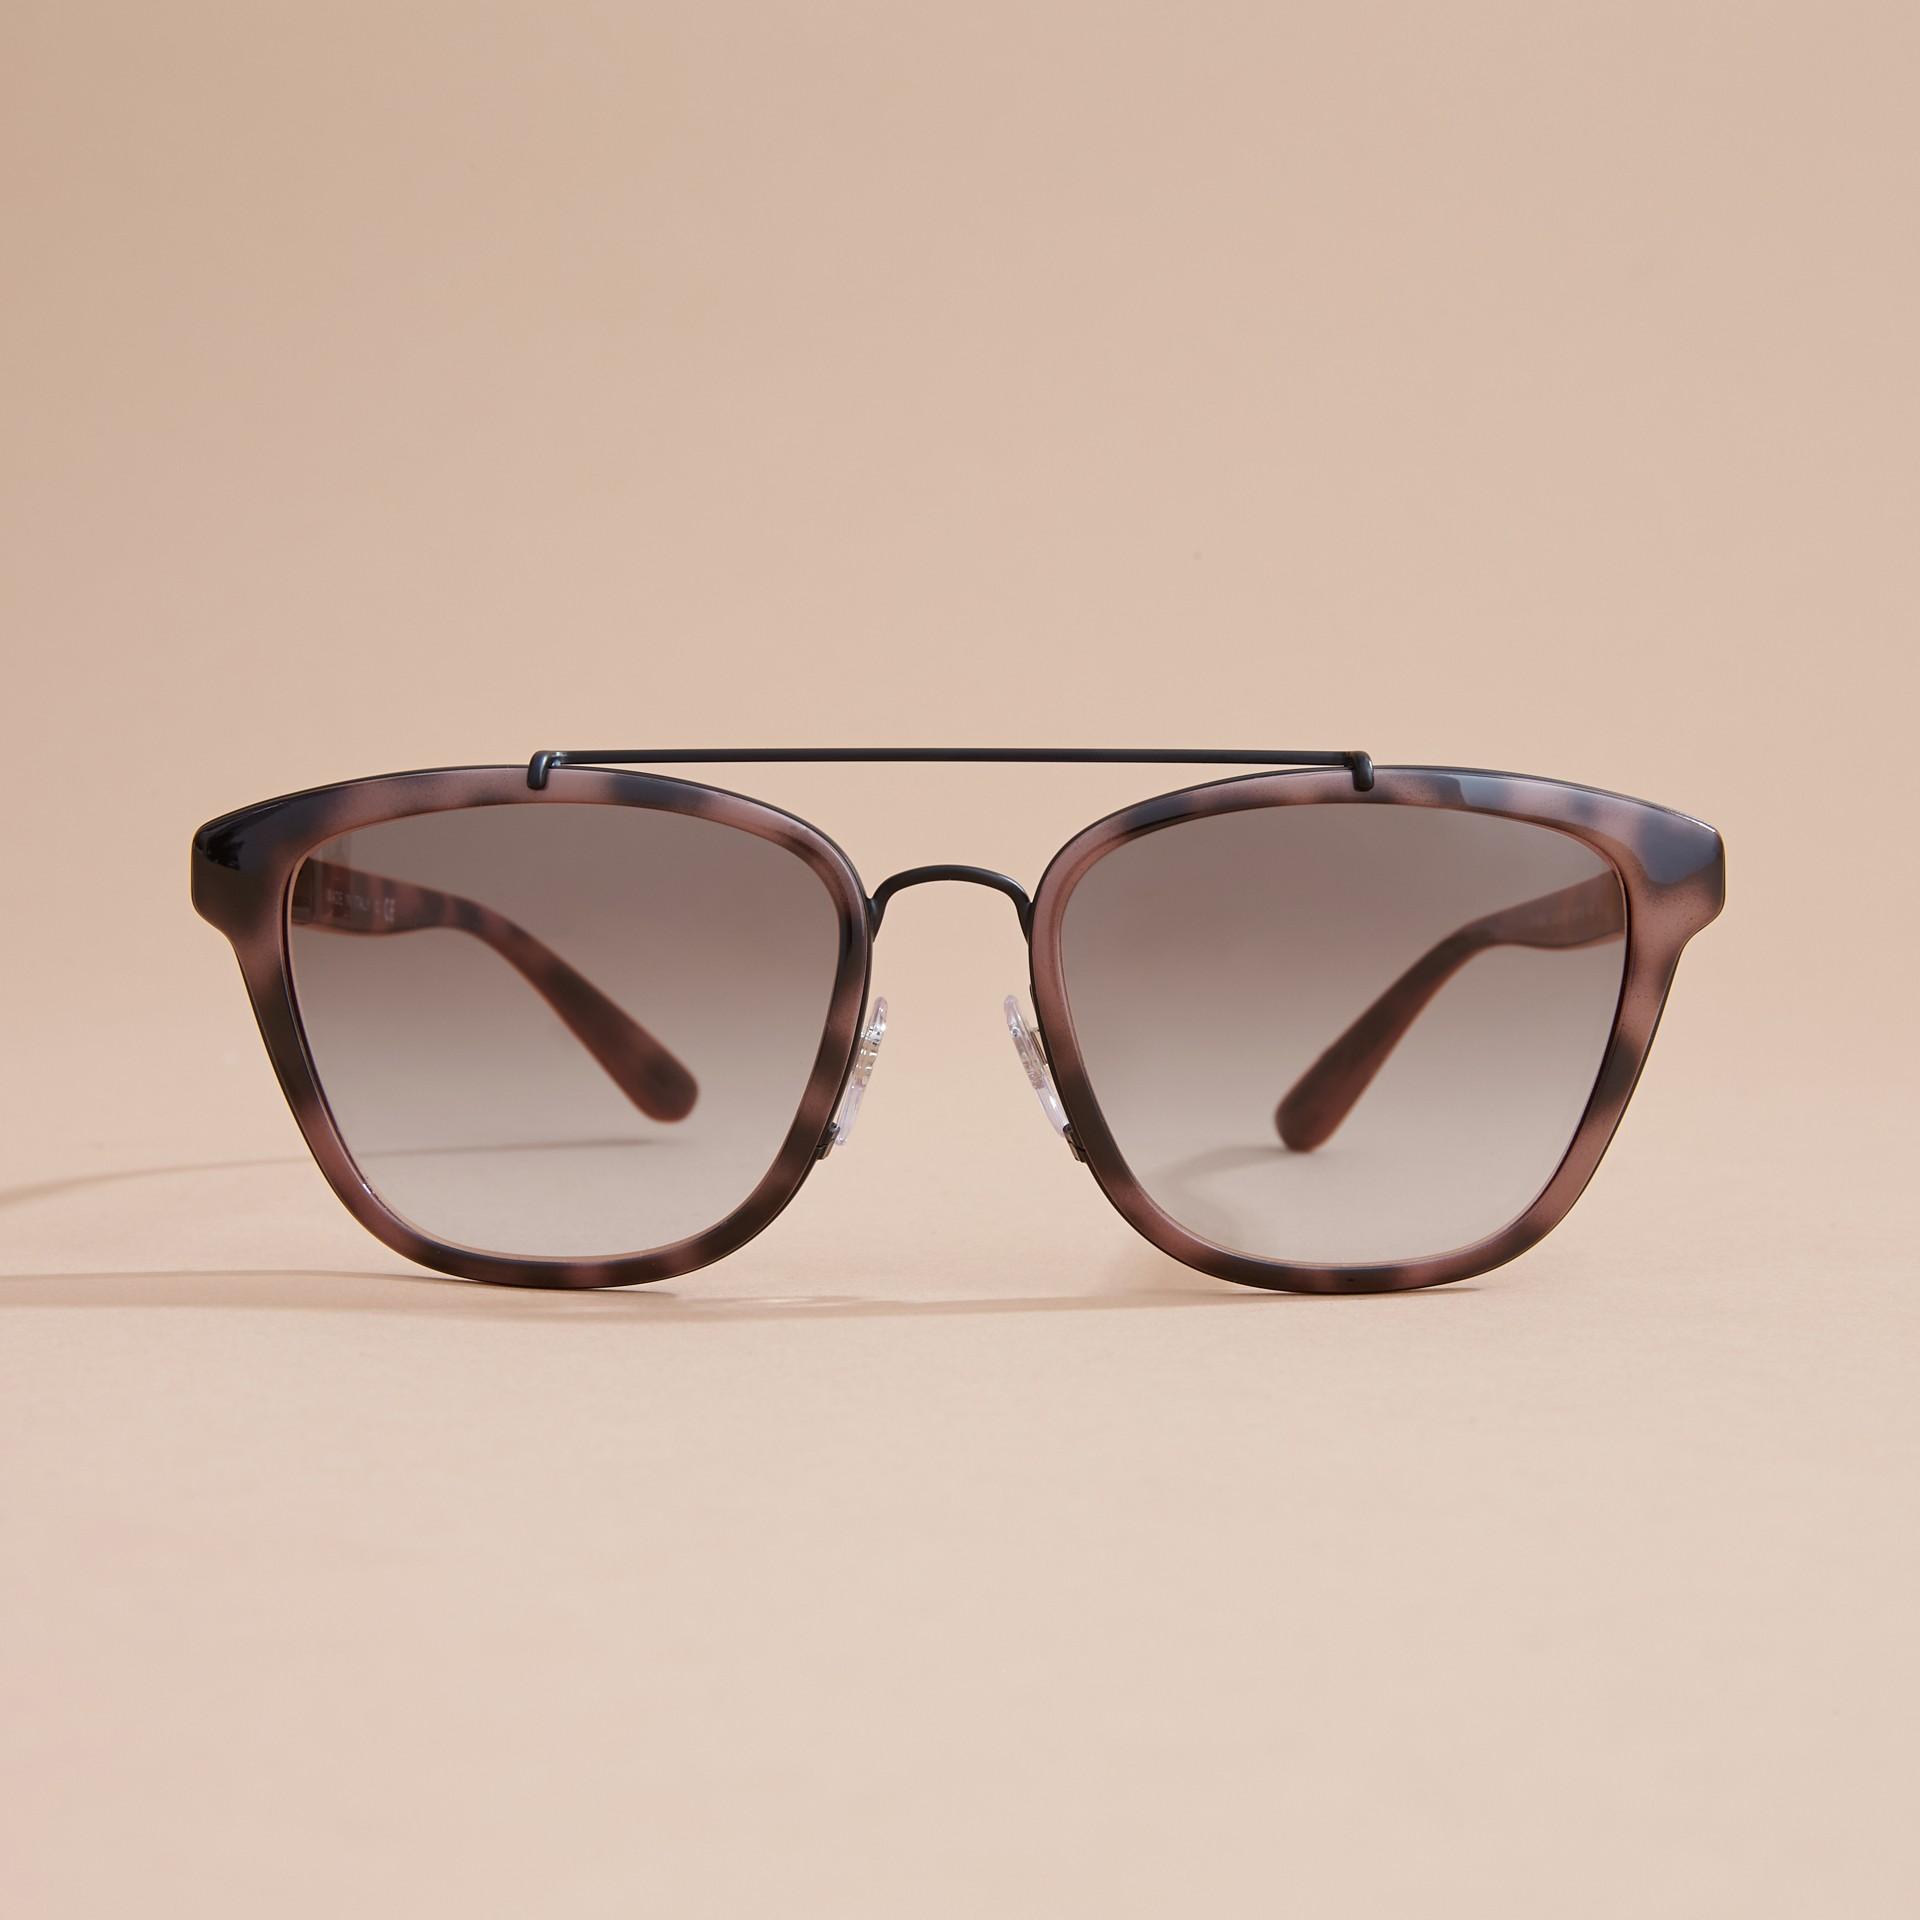 Top Bar Square Frame Sunglasses Tortoiseshell - gallery image 3